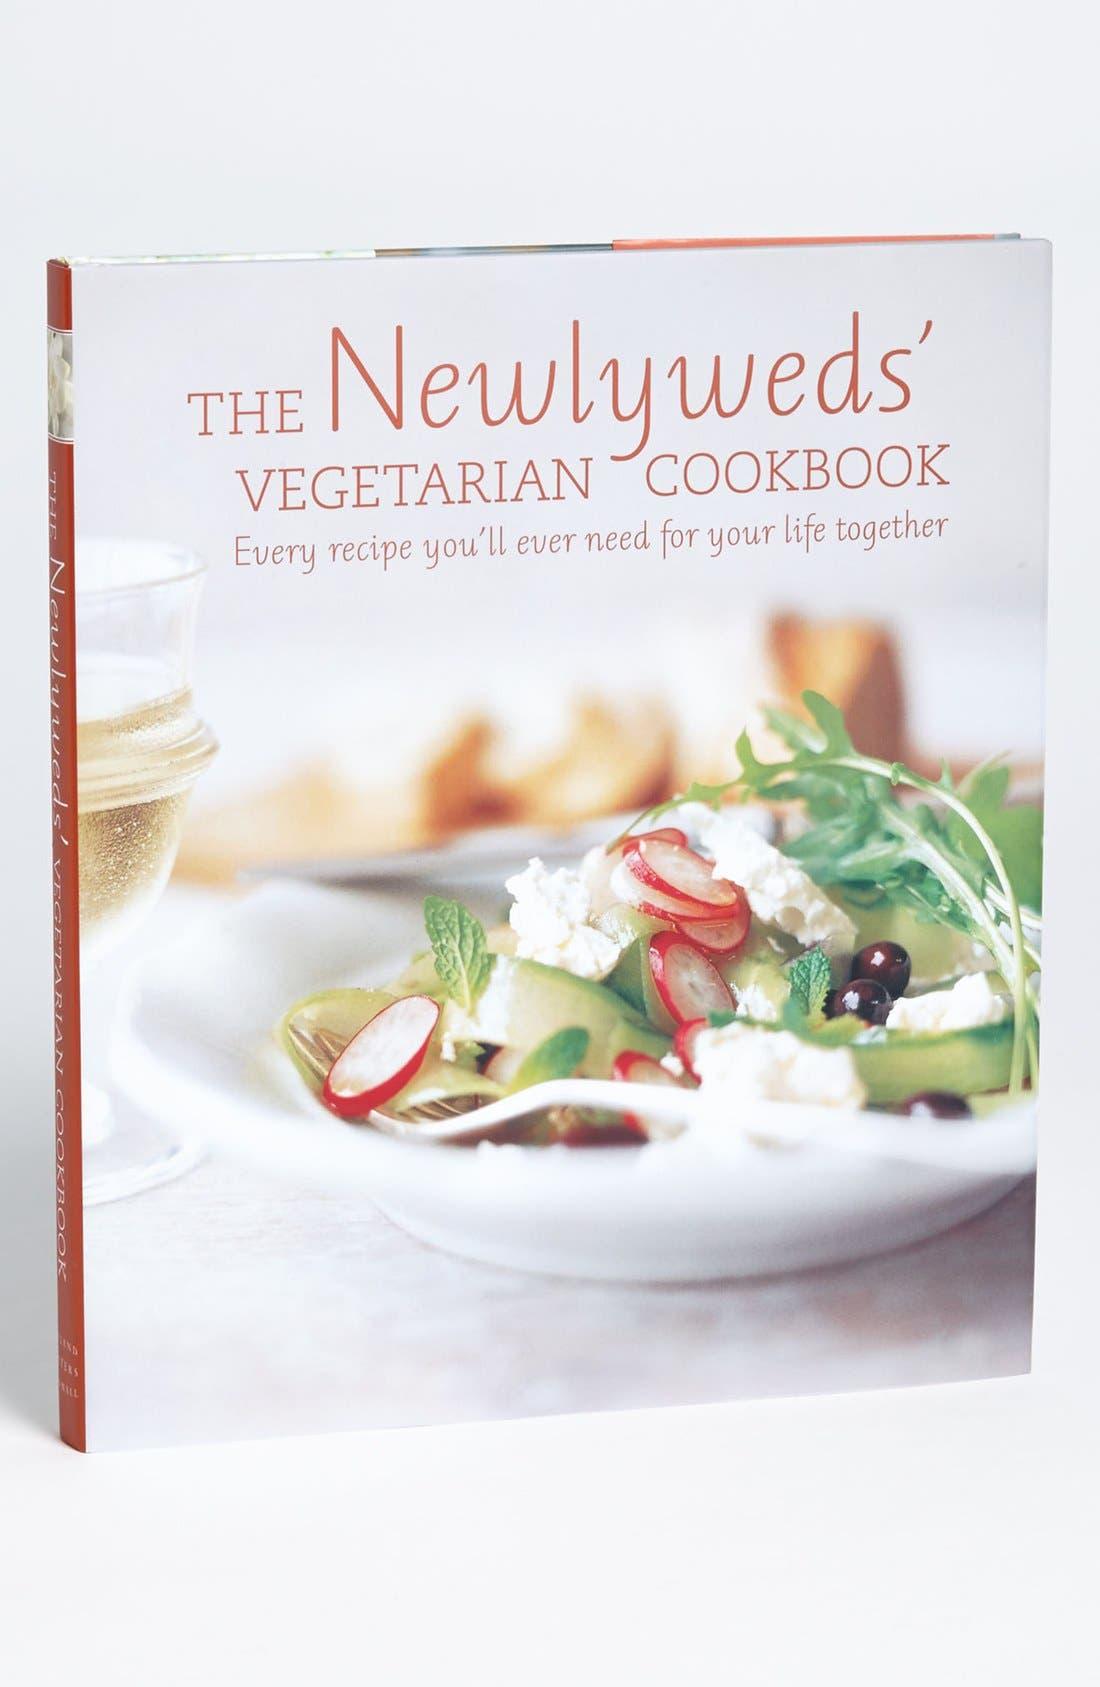 Alternate Image 1 Selected - 'The Newlyweds Vegetarian Cookbook'